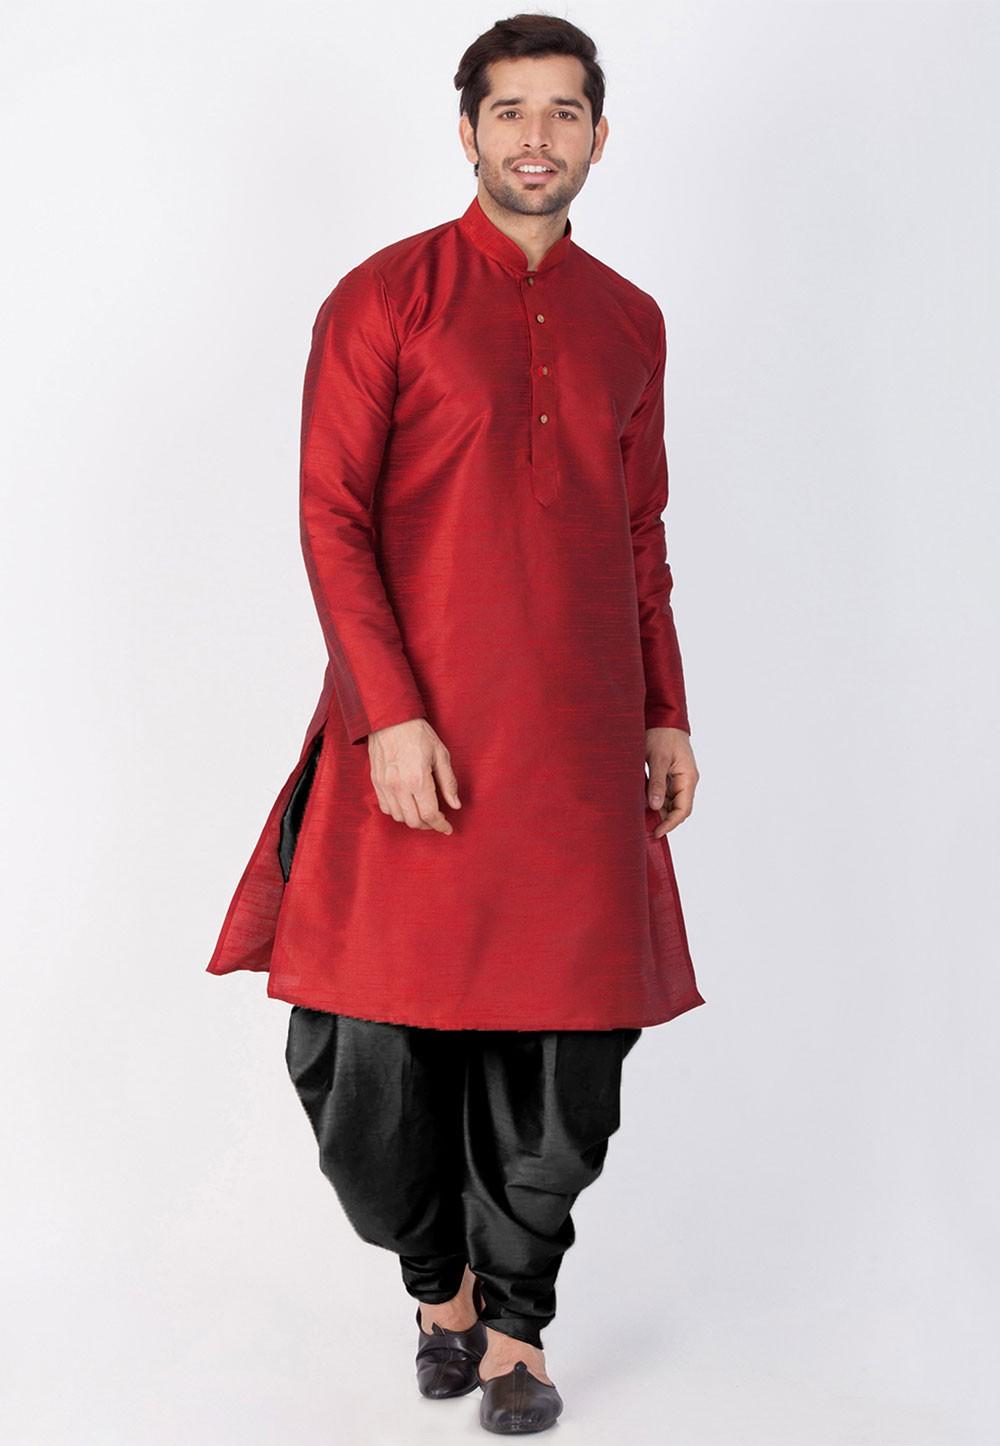 Readymade: Buy Dhoti Kurta Online for Men in Maroon Color